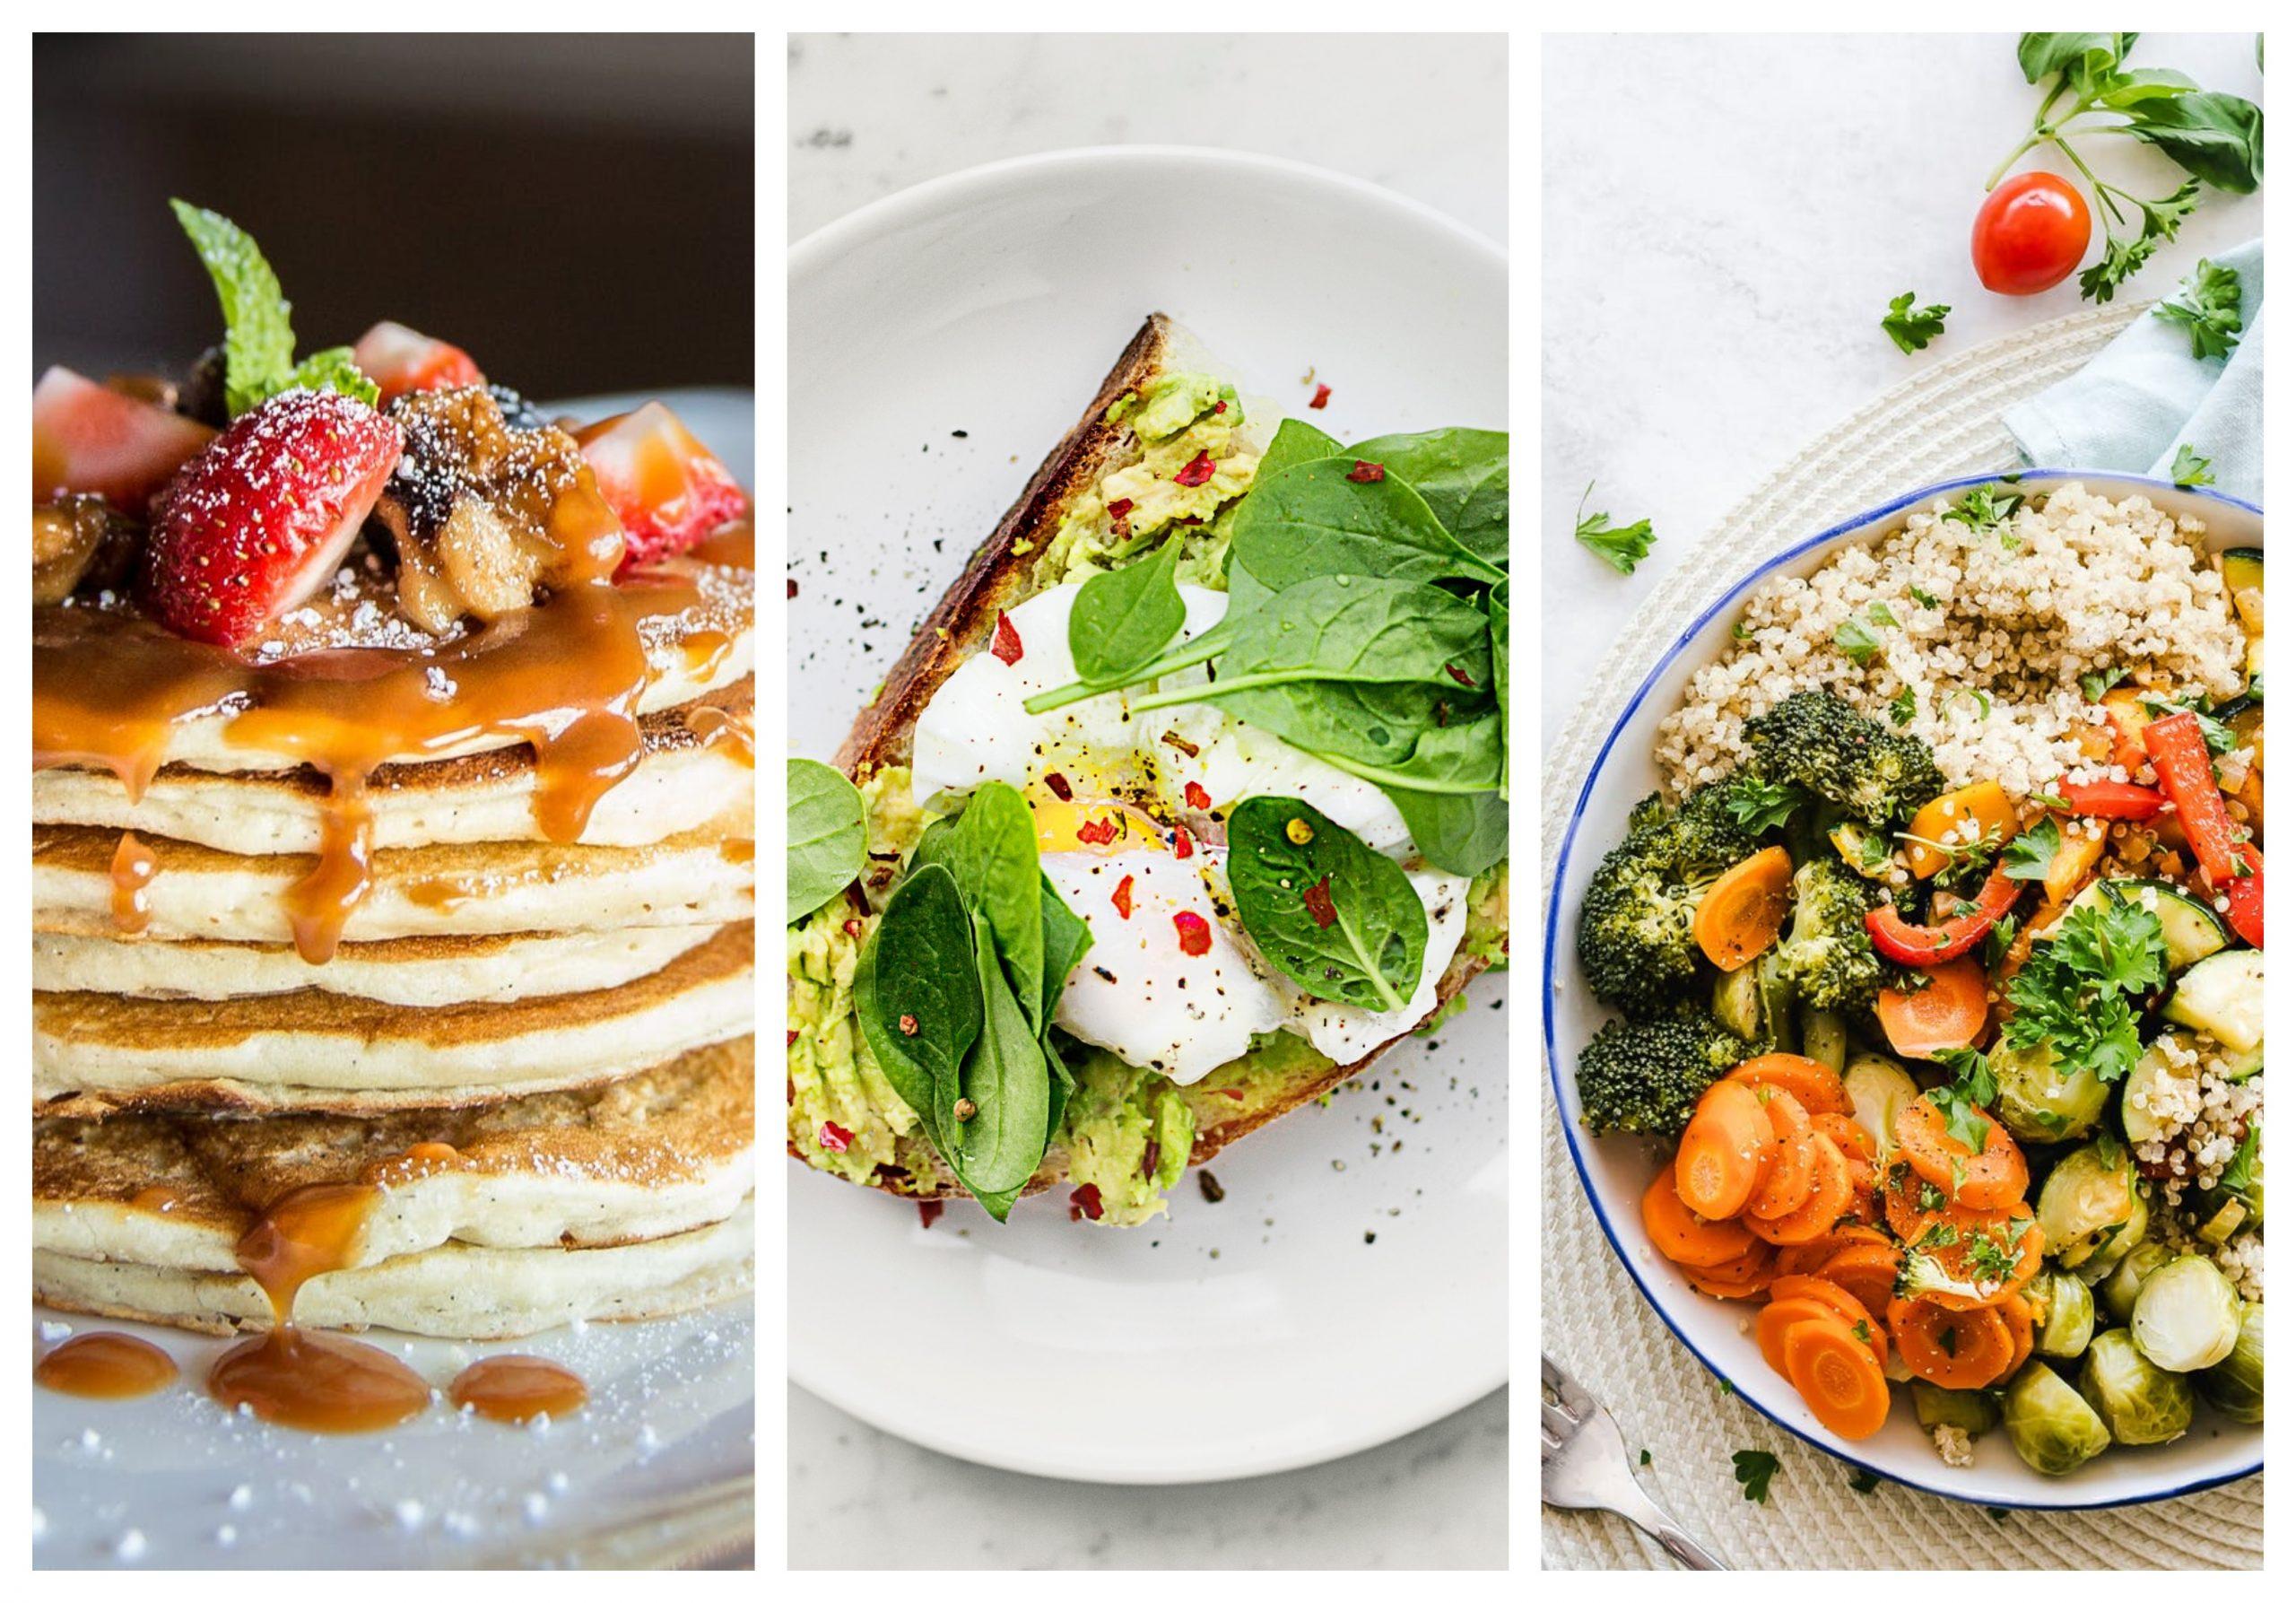 Menú de la semana: Platillos que no deben faltar en tu mesa